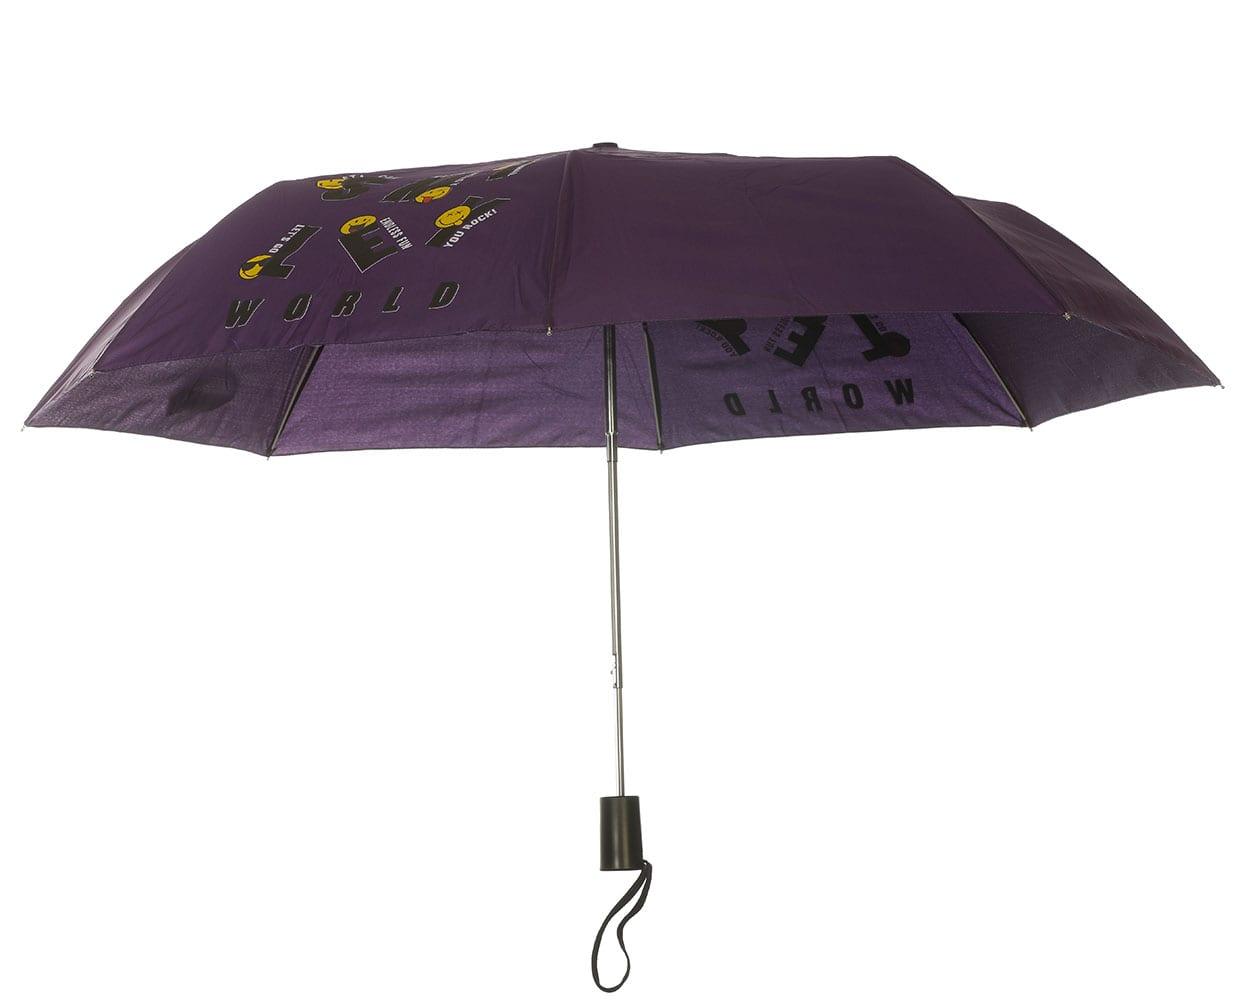 Smiley World Ομπρέλα Σπαστή με Αυτόματο Μηχανισμό SML-9430 Μώβ